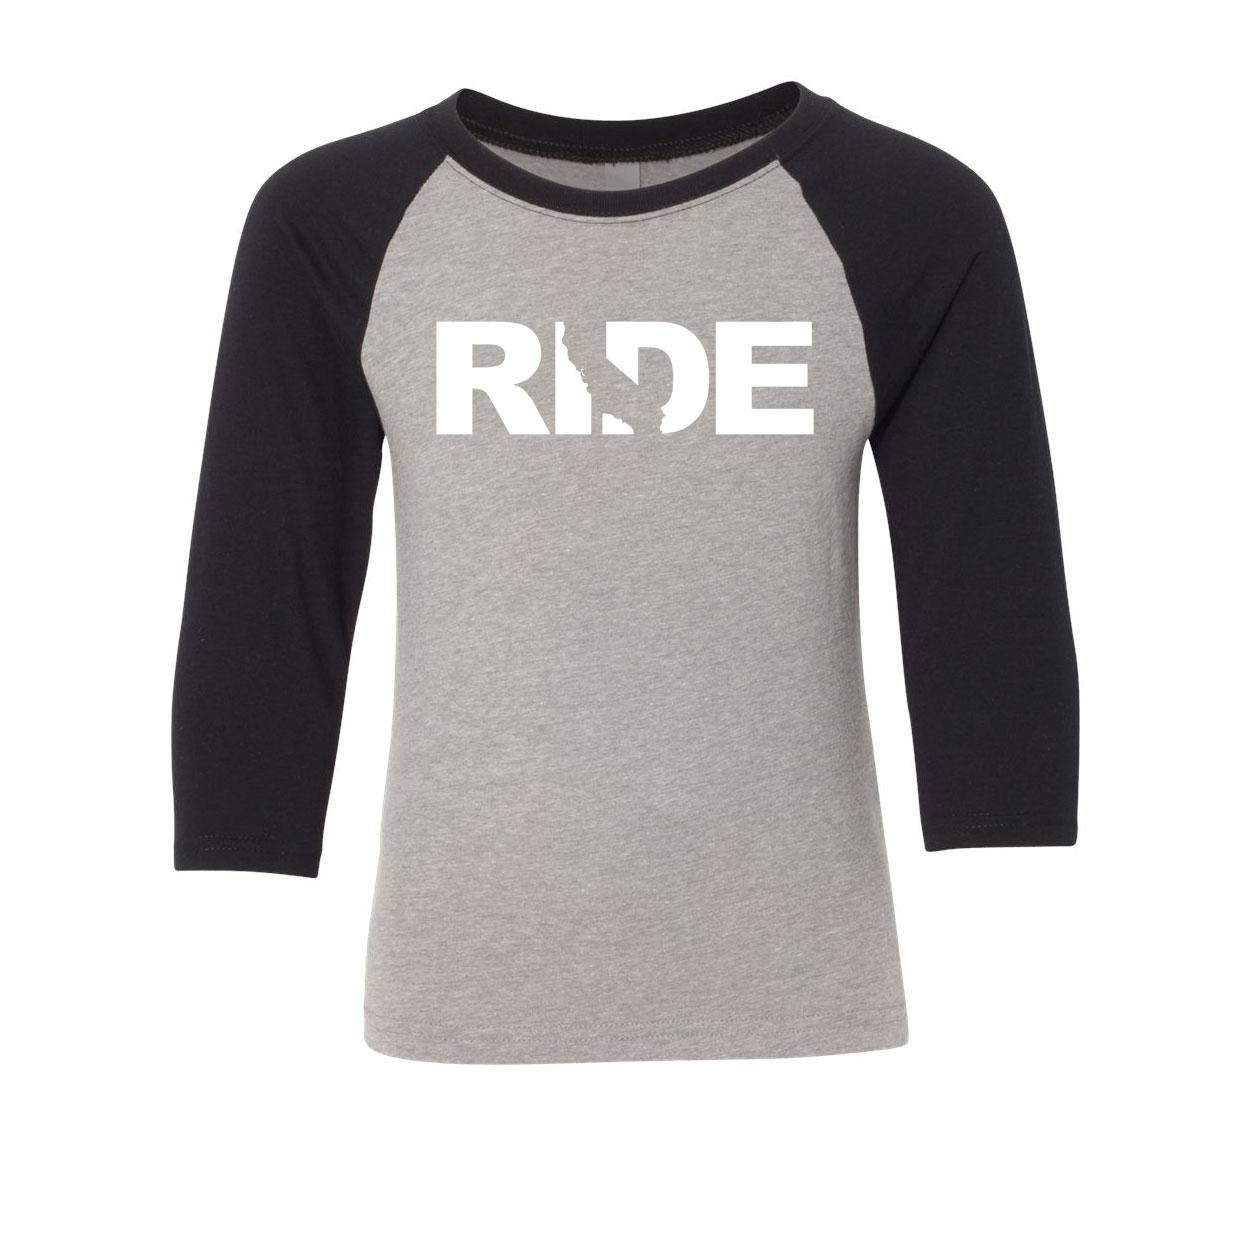 Ride California Classic Youth Premium Raglan Shirt Gray/Black (White Logo)